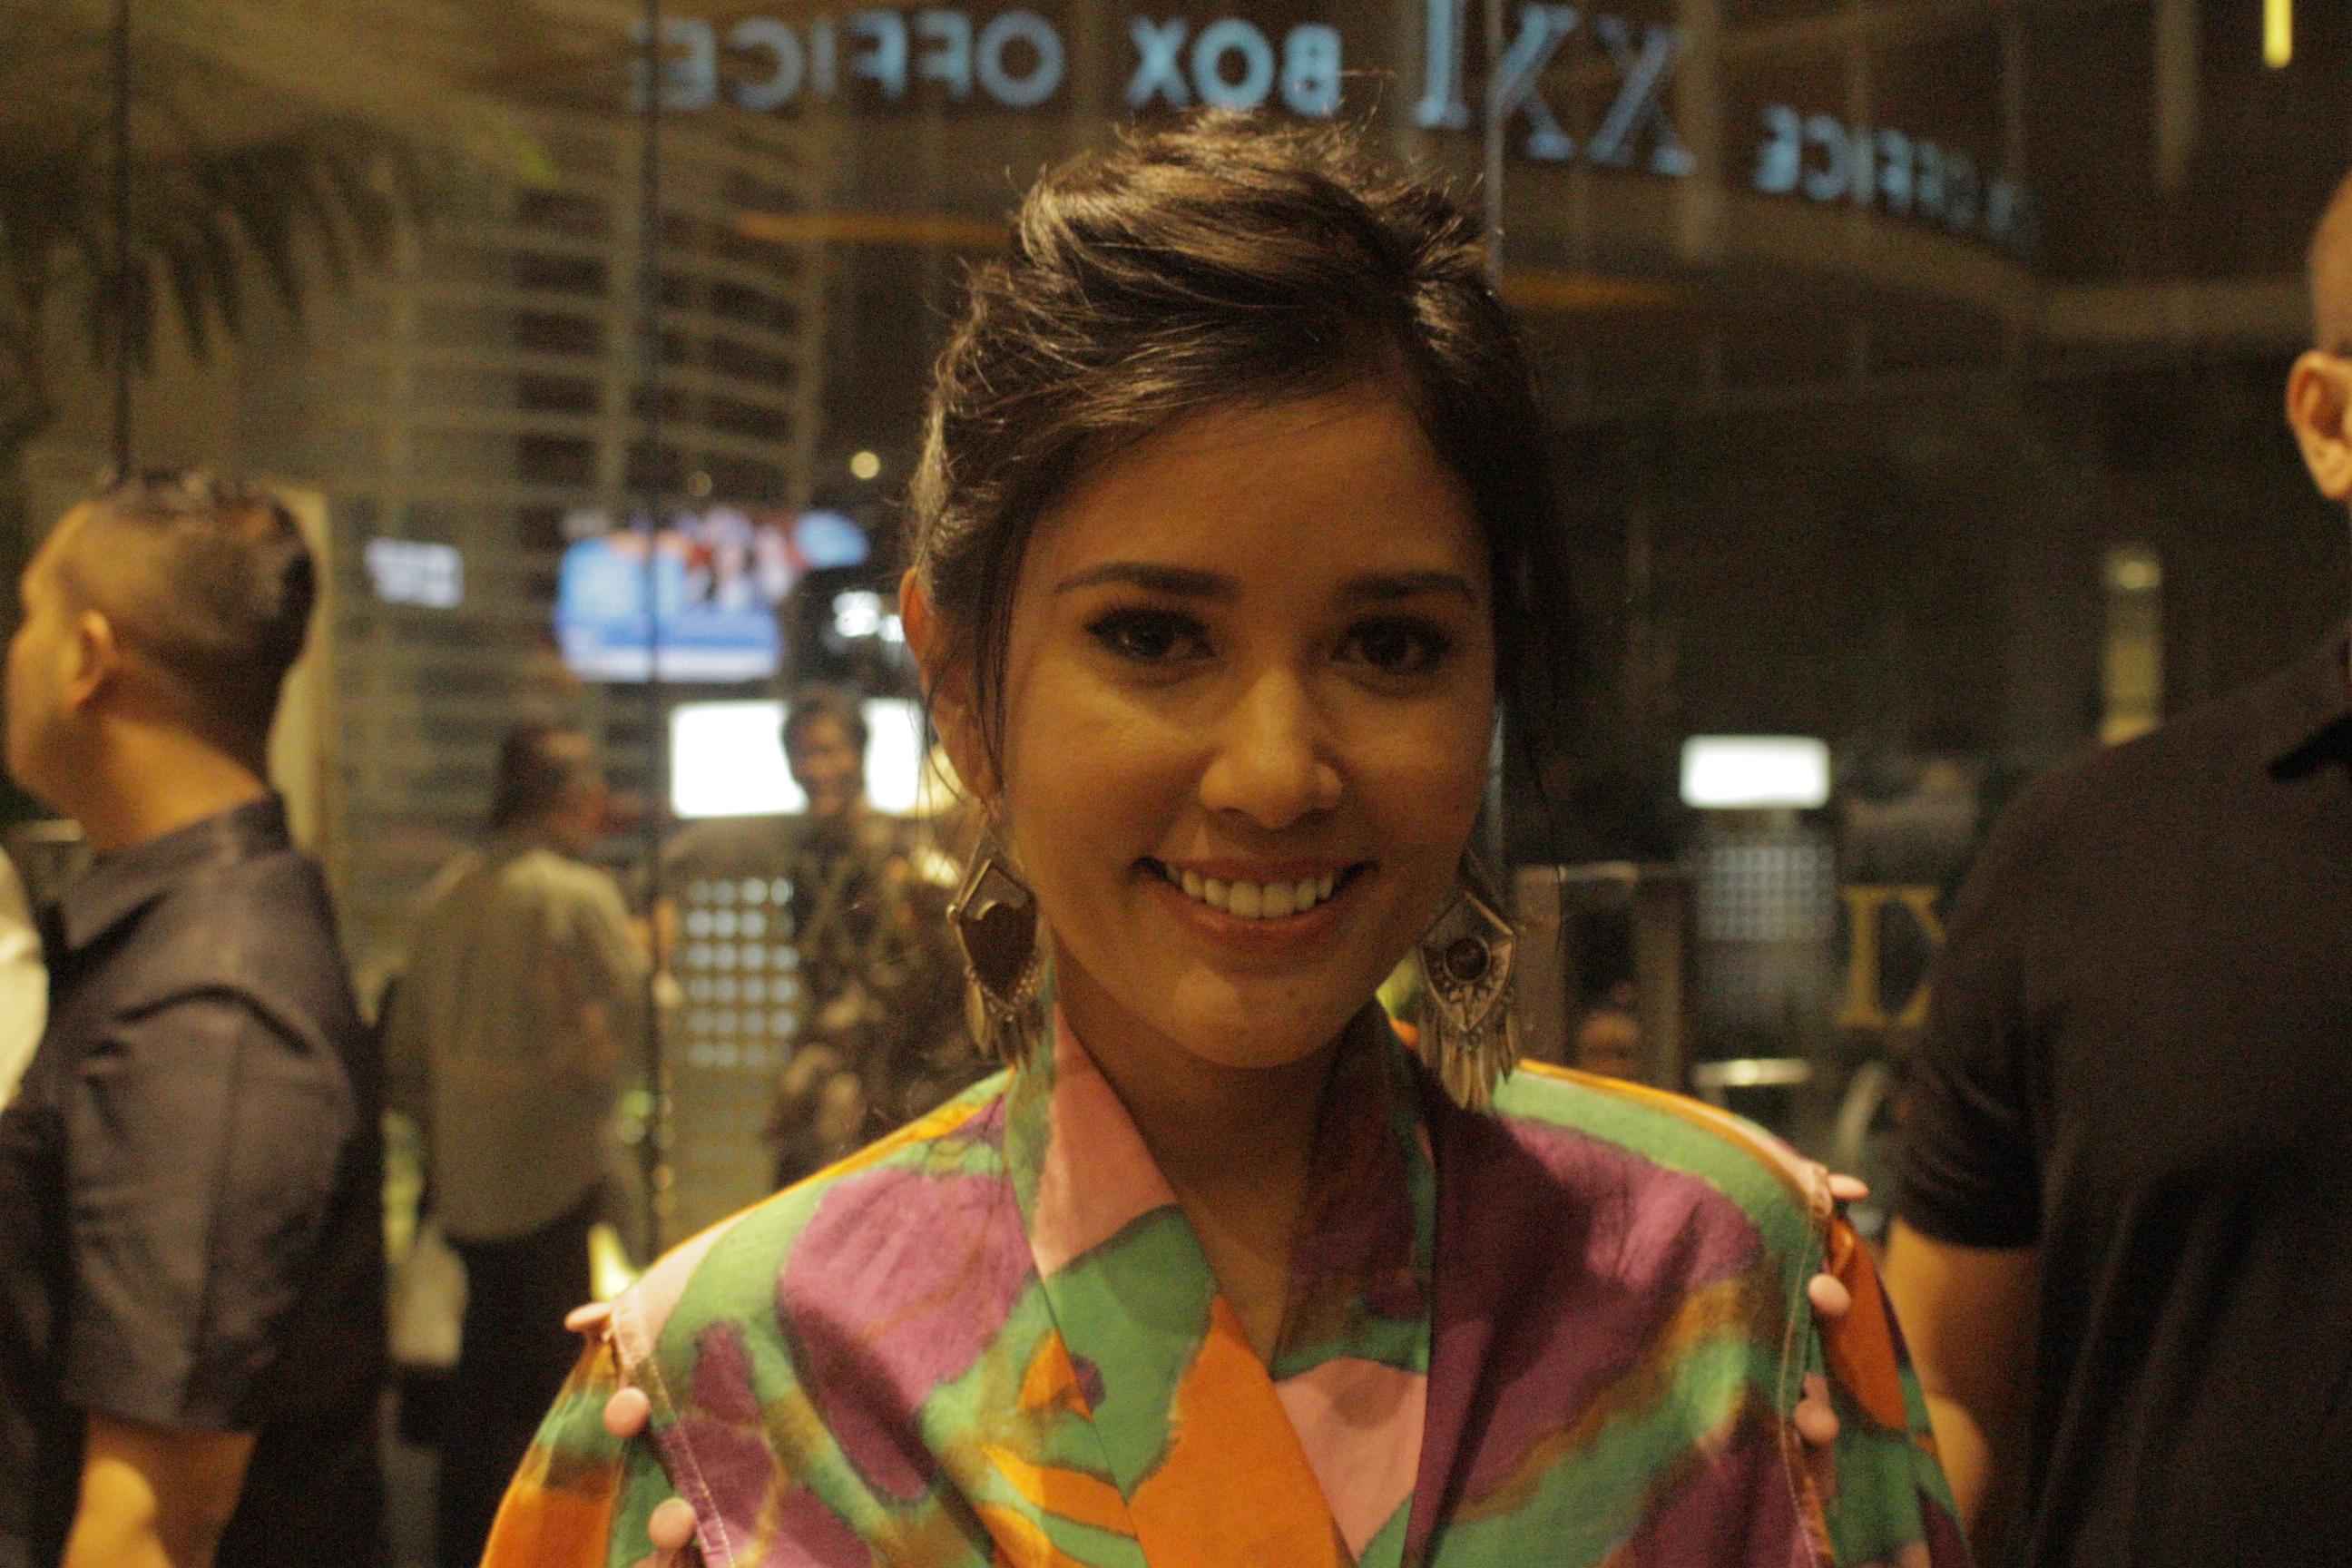 Aktris Titi Rajo Bintang. Foto oleh Diego Batara/Rappler